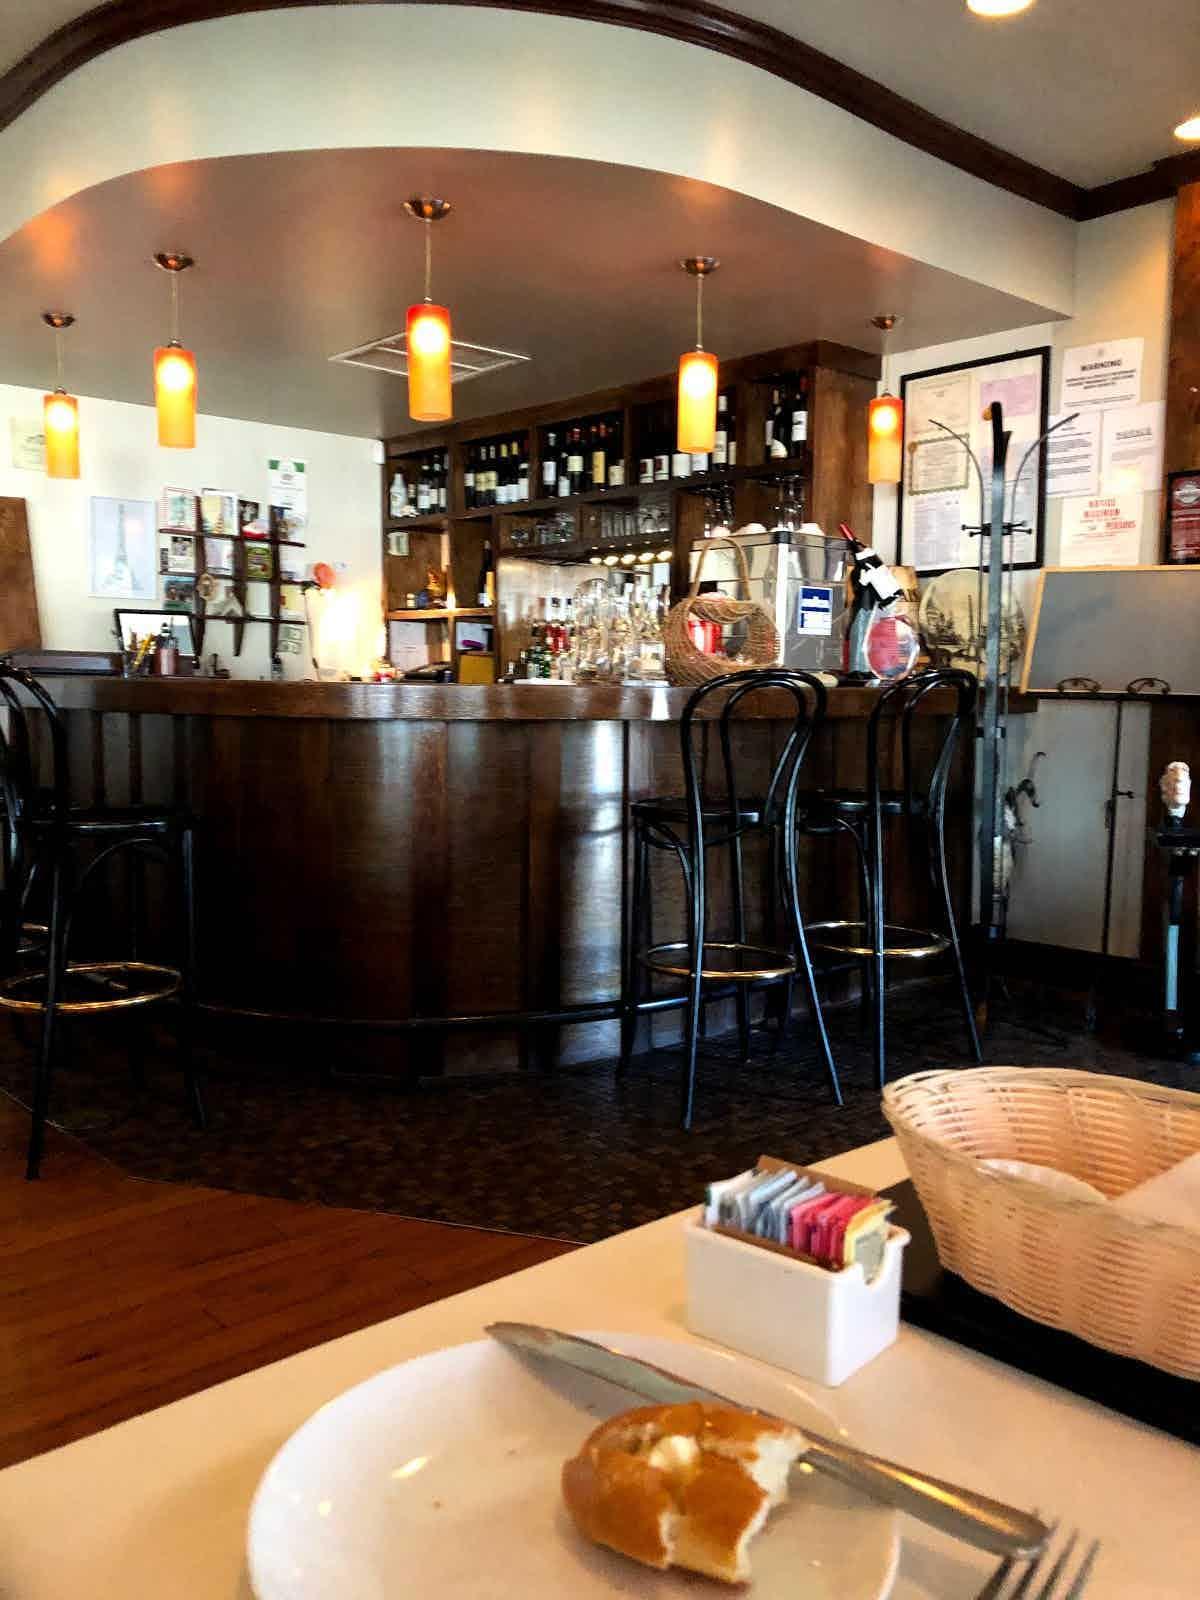 La Petite Maison Atlanta la petite maison - atlanta | restaurant review - zagat